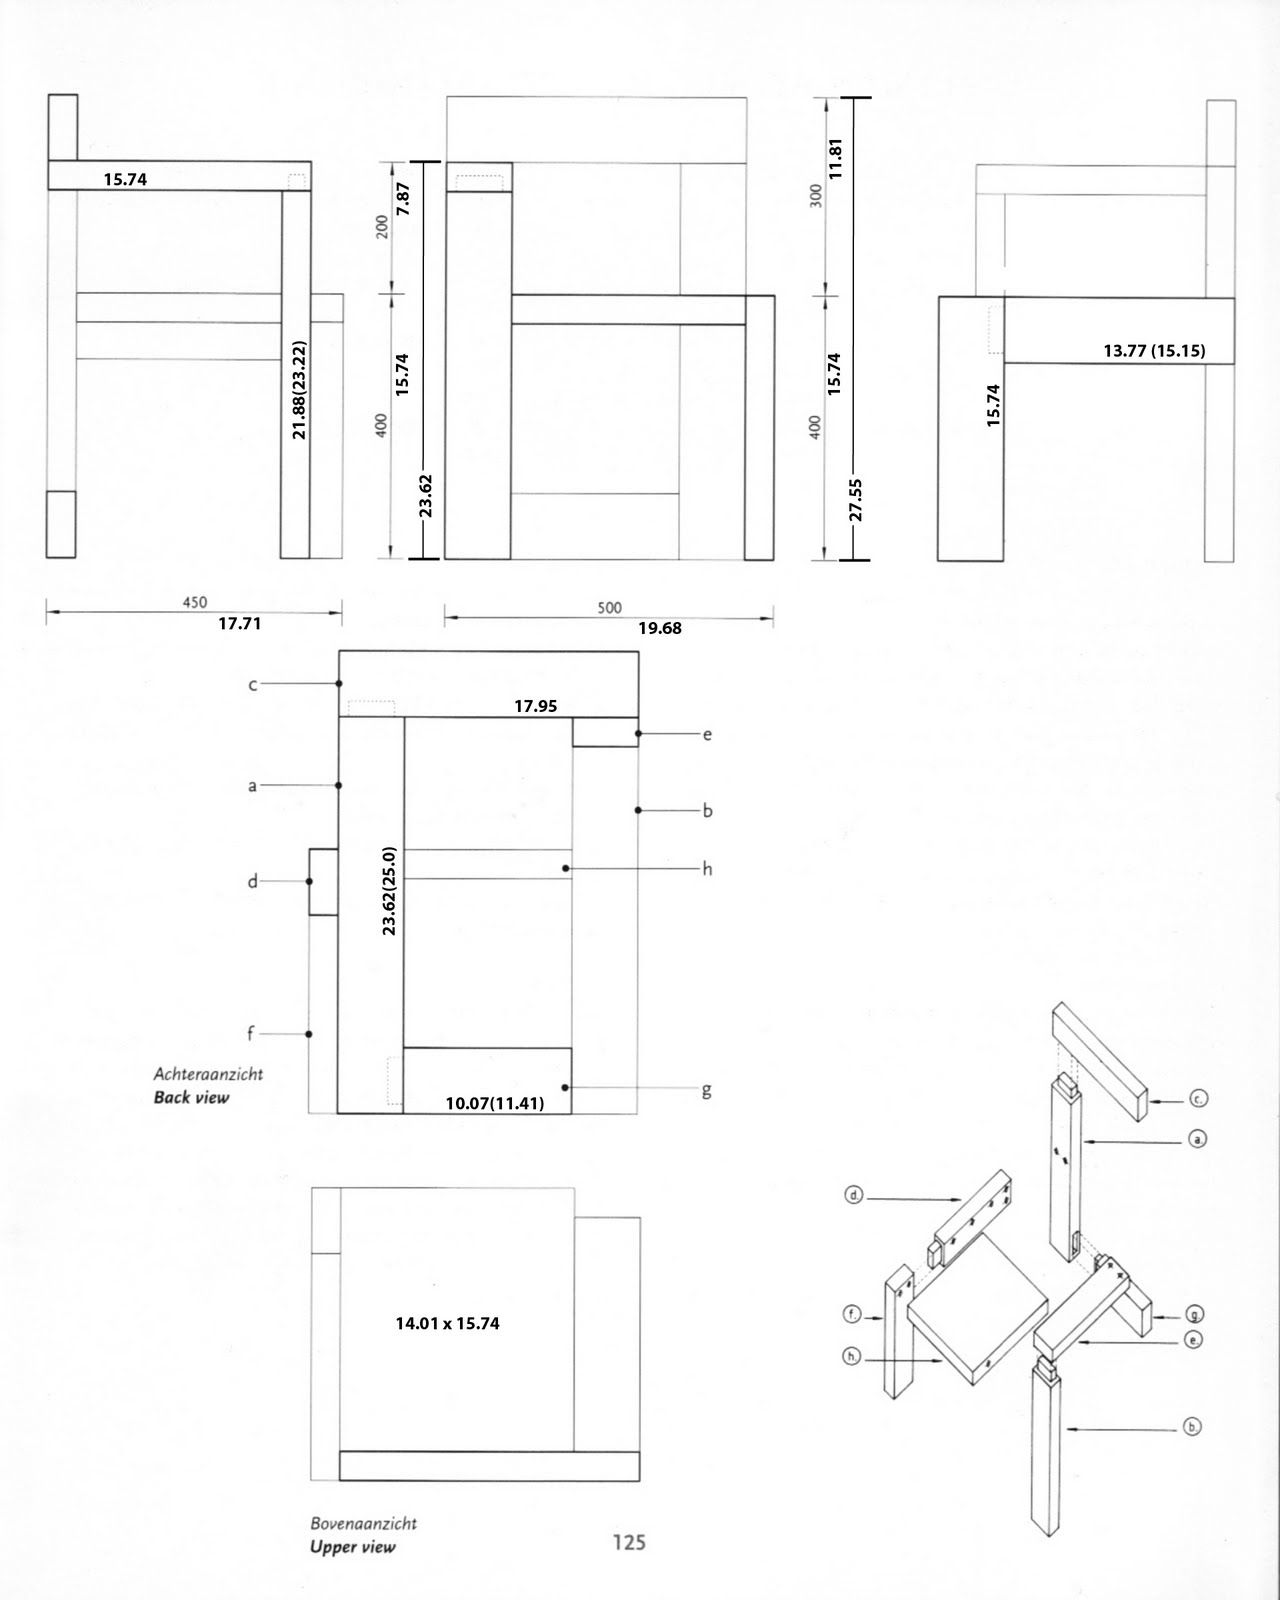 Steltman chair rietveld chair plans etear sheet for Sillas para planos